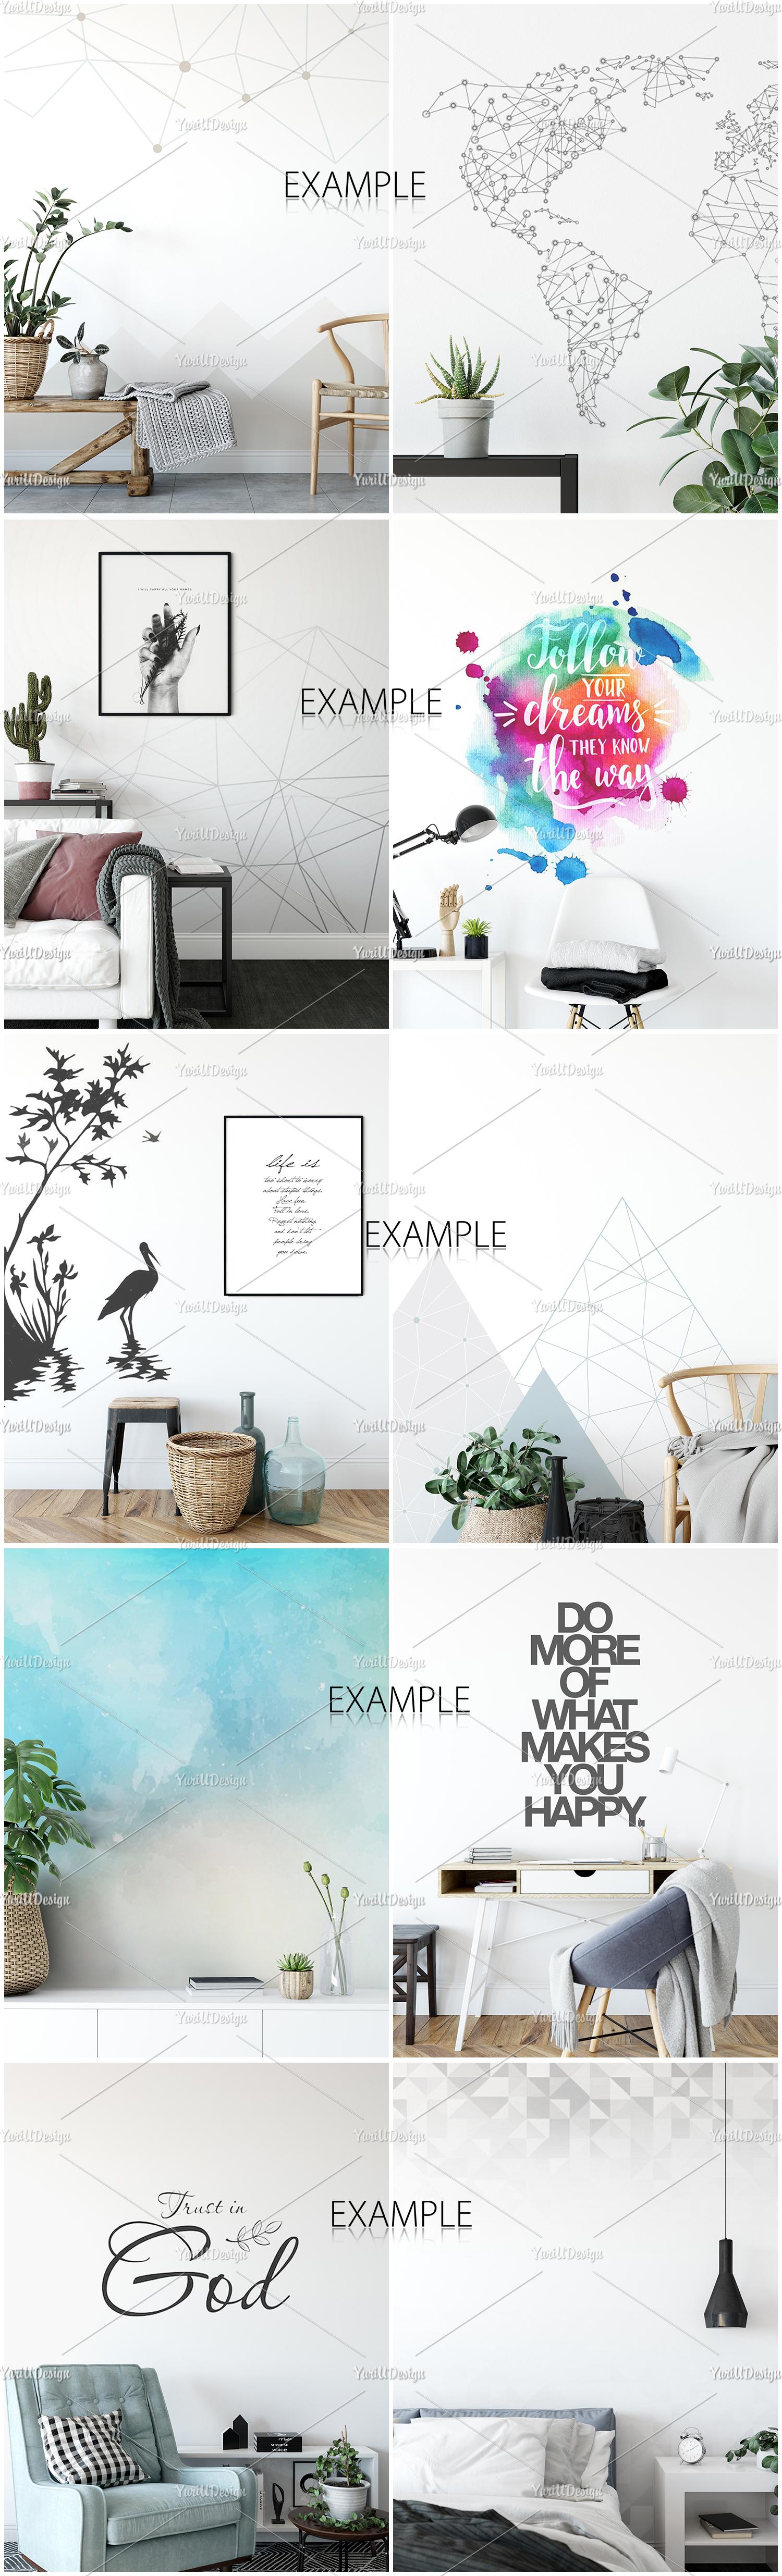 Scandinavian Interior Frames & Walls Mockup Bundle example image 9